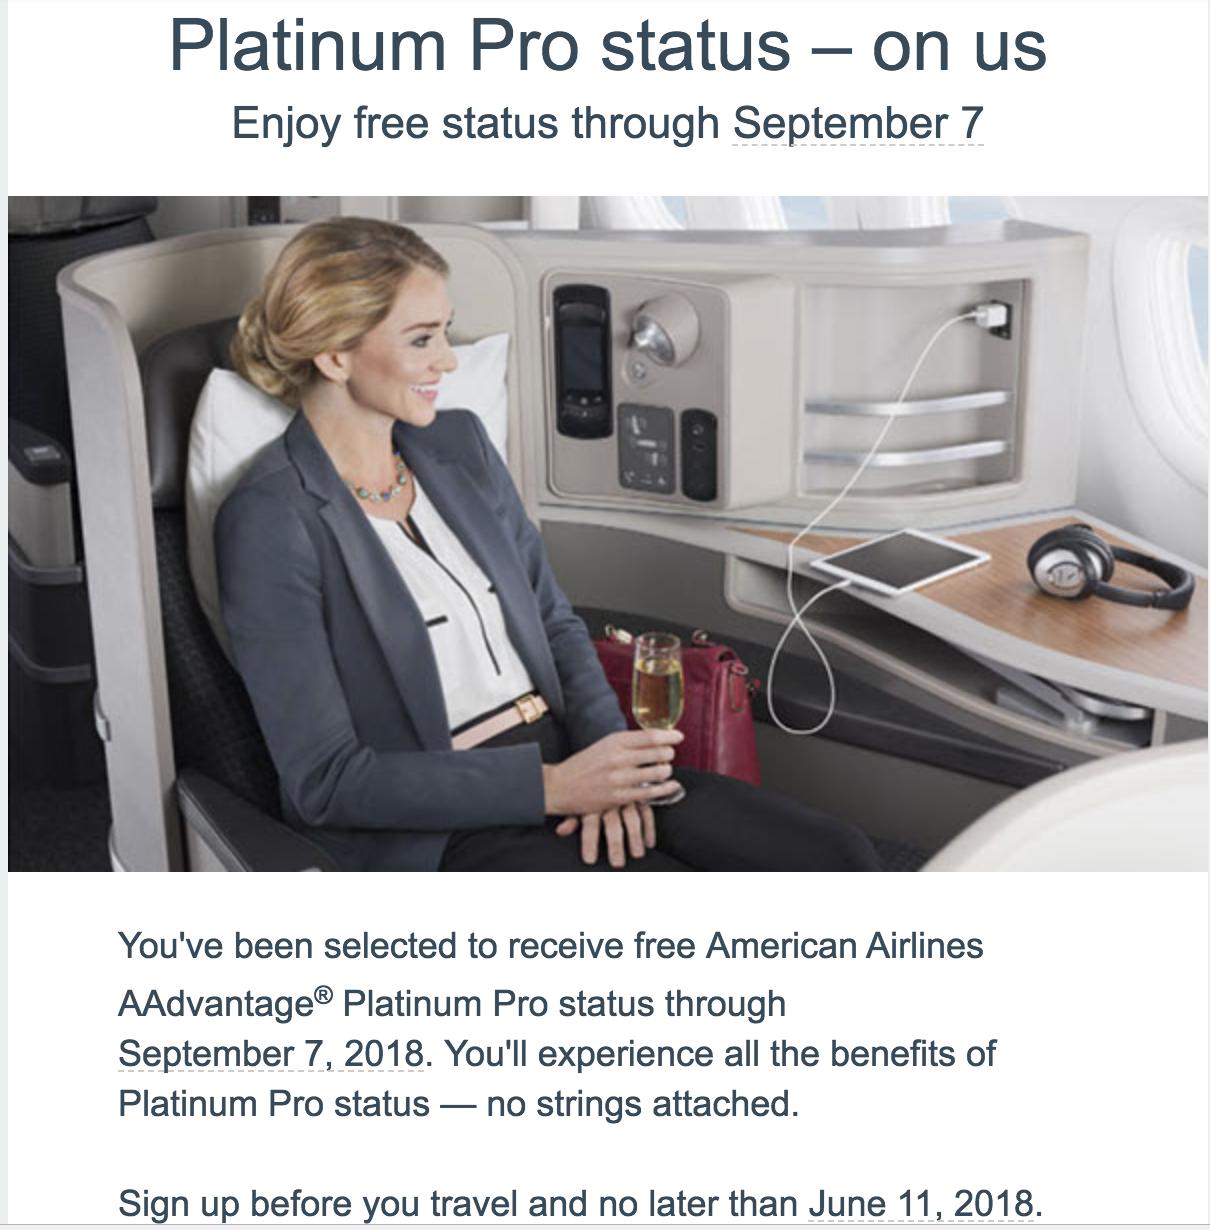 Free Platinum Pro Status until 9/7 on American Airlines AAdvantage YMMV